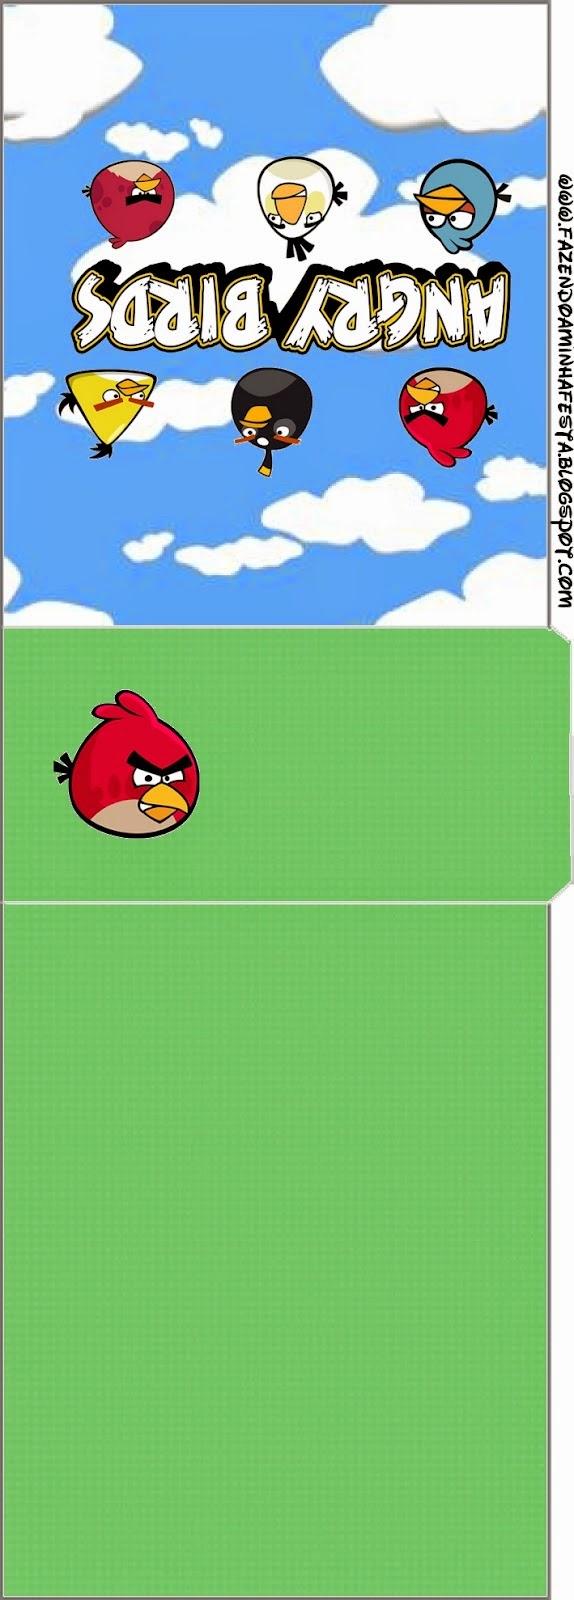 Etiqueta para Tic Tac de Angry birds con Nubes.